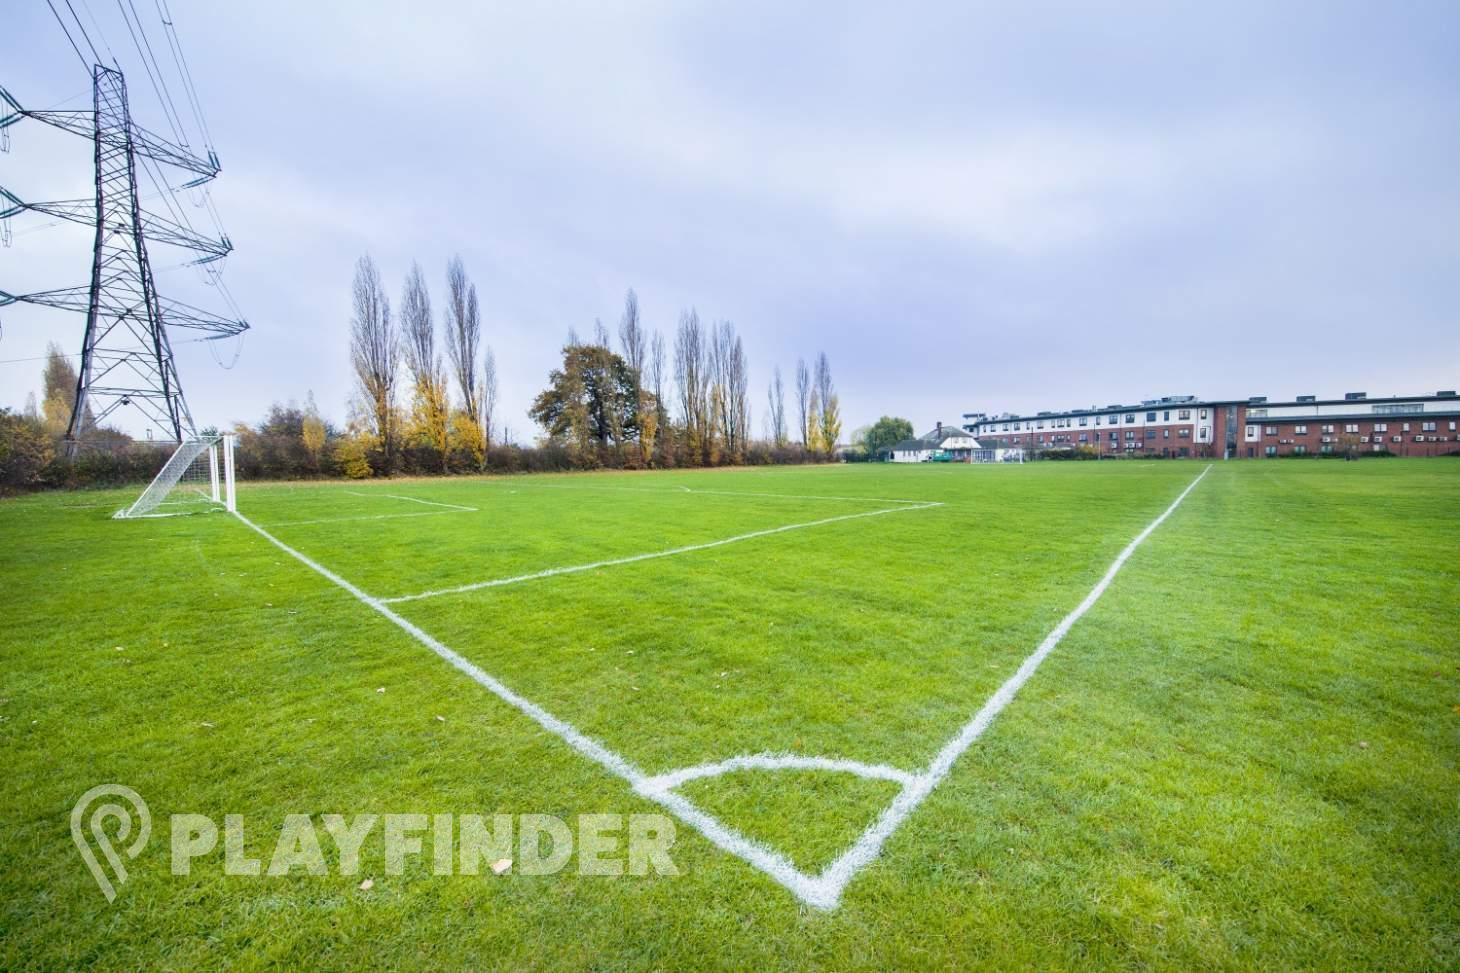 Britannia Playing Fields 11 a side   Grass football pitch